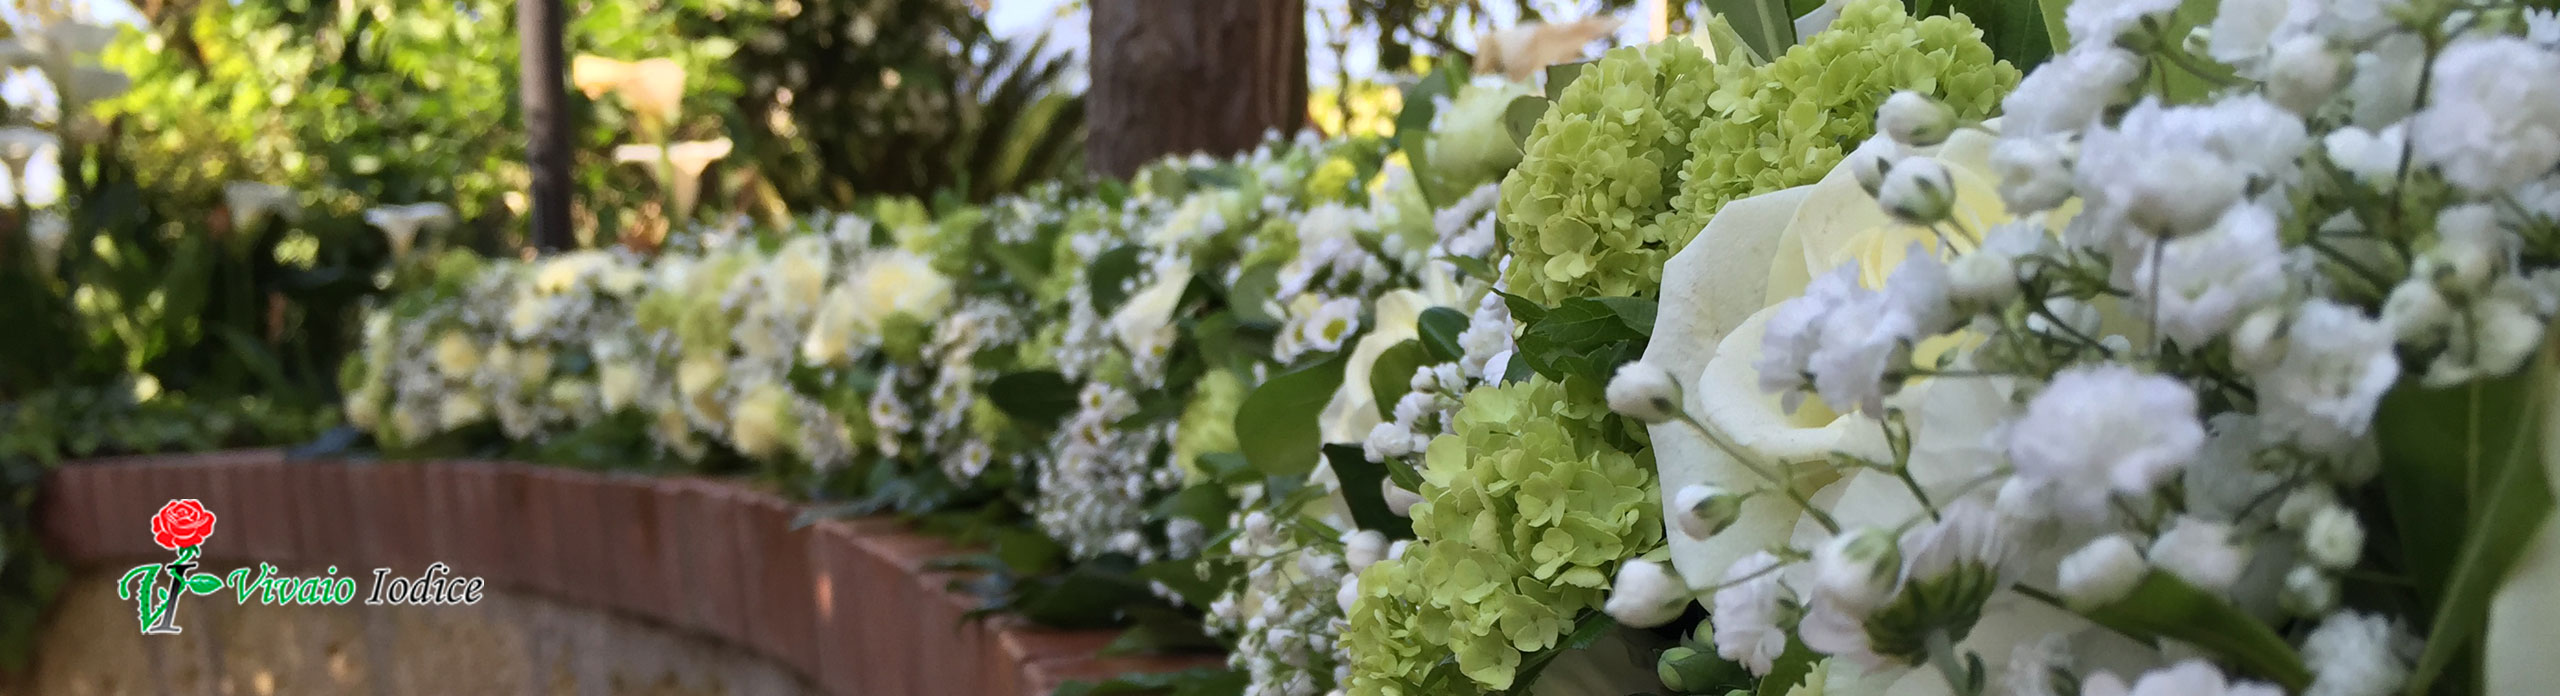 Siepi Miste Da Giardino piante da esterno | vivaio iodice matrimoni ed eventi